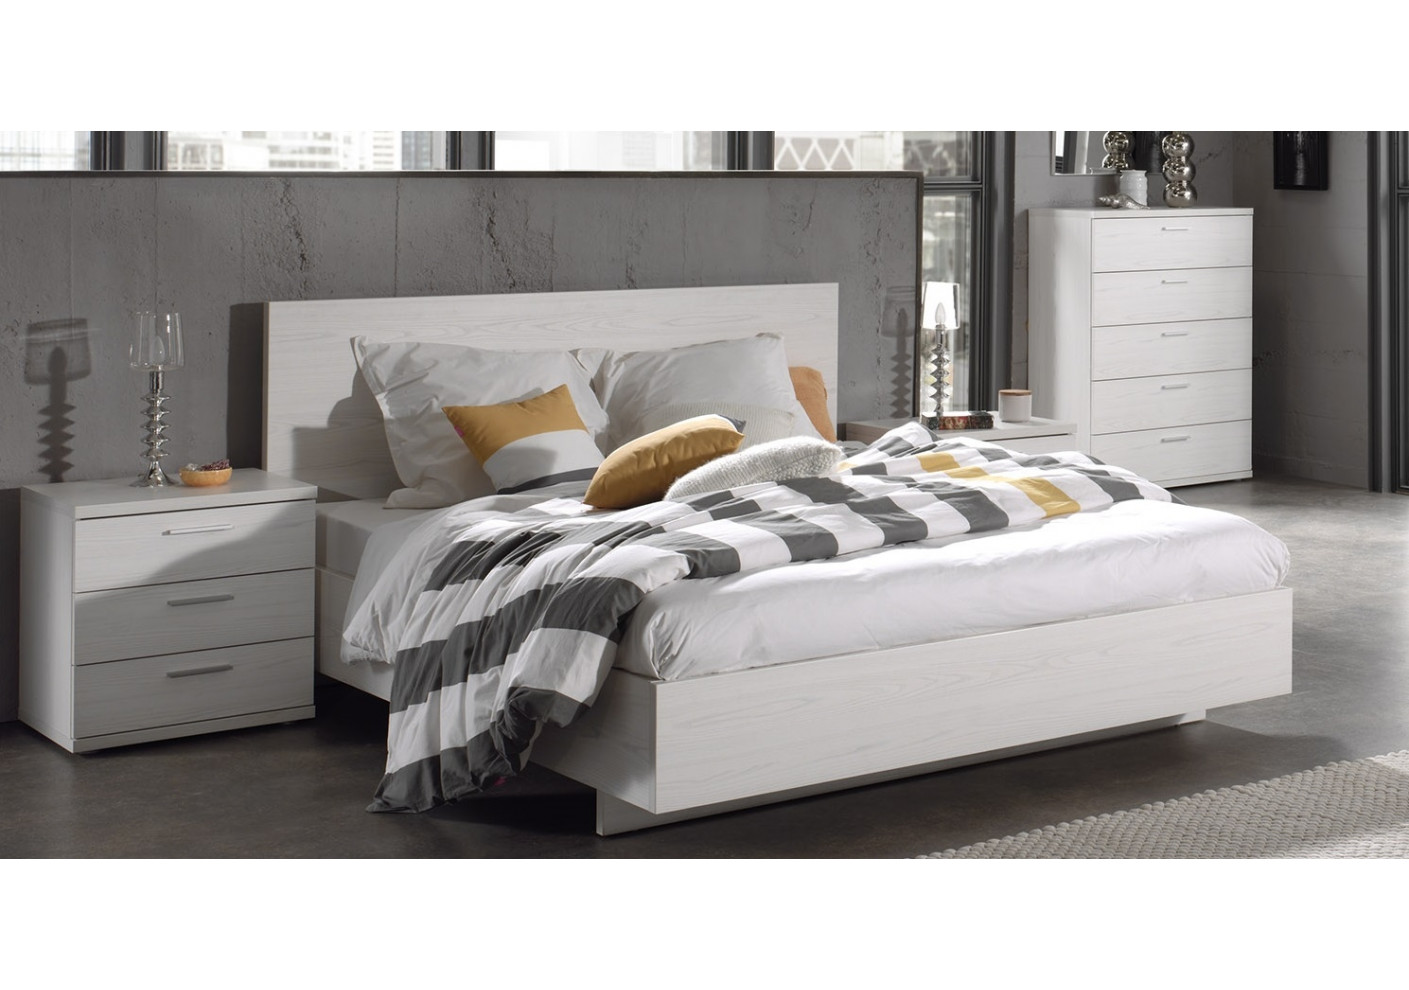 lit 160x200 gael ch ne moonlight. Black Bedroom Furniture Sets. Home Design Ideas